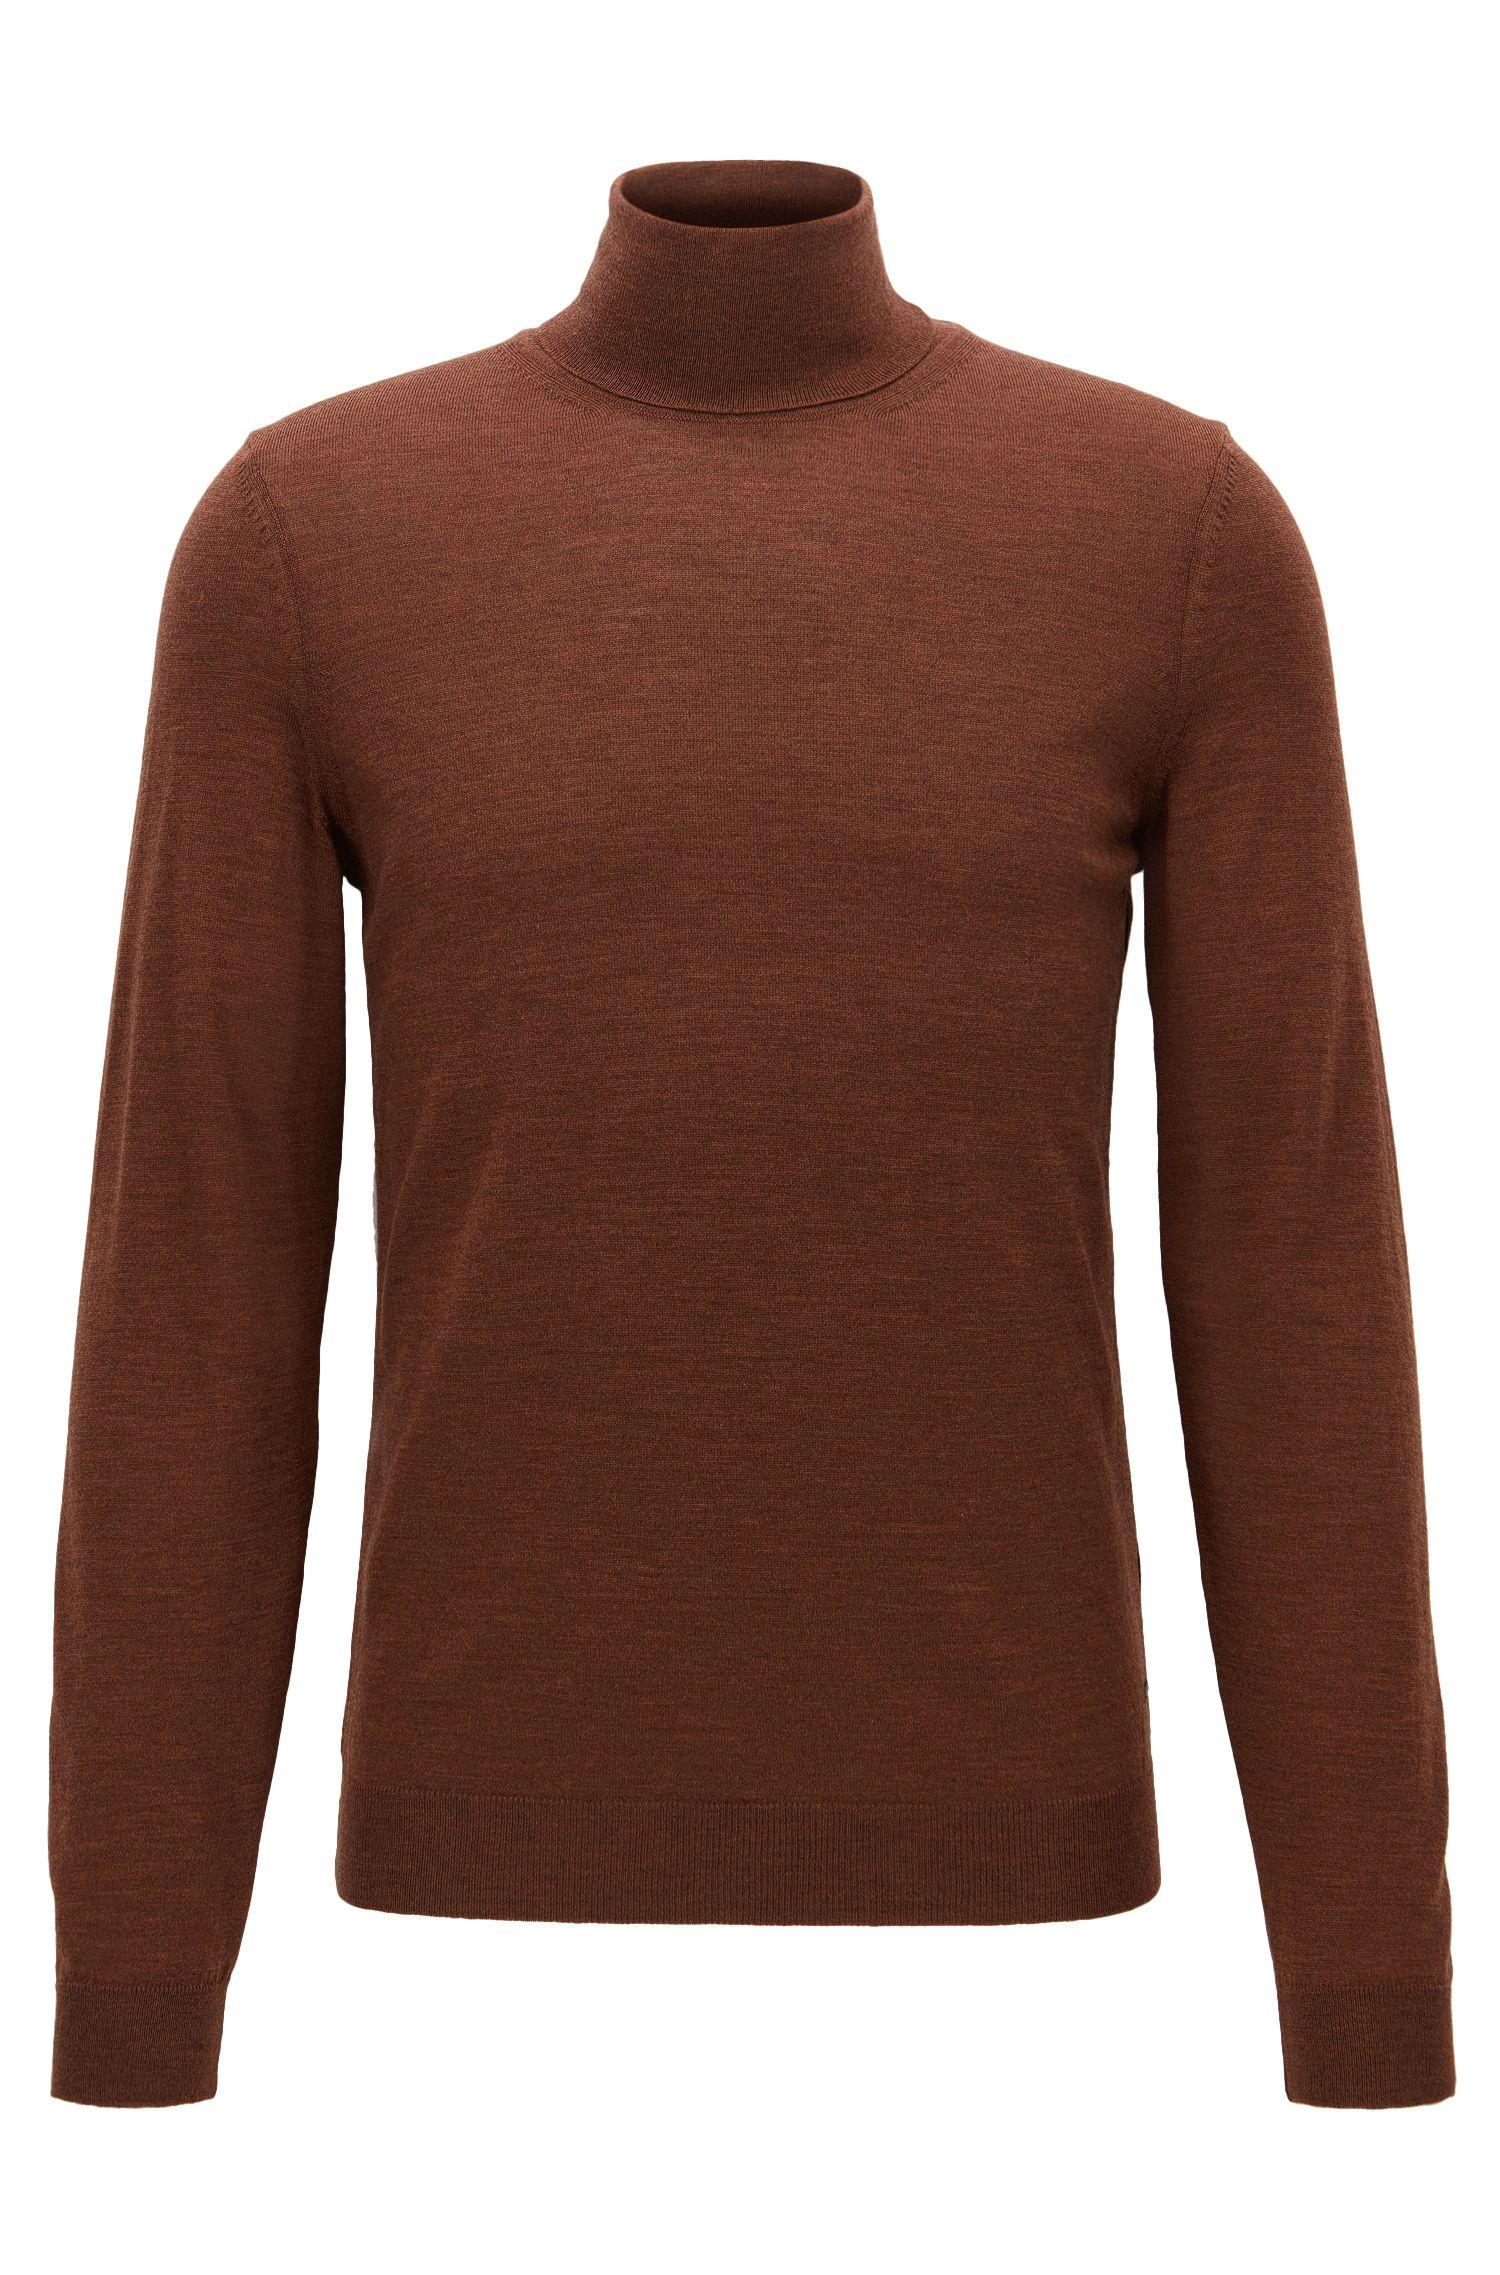 Turtleneck Extra-Fine Merino Wool Sweater | Musso N